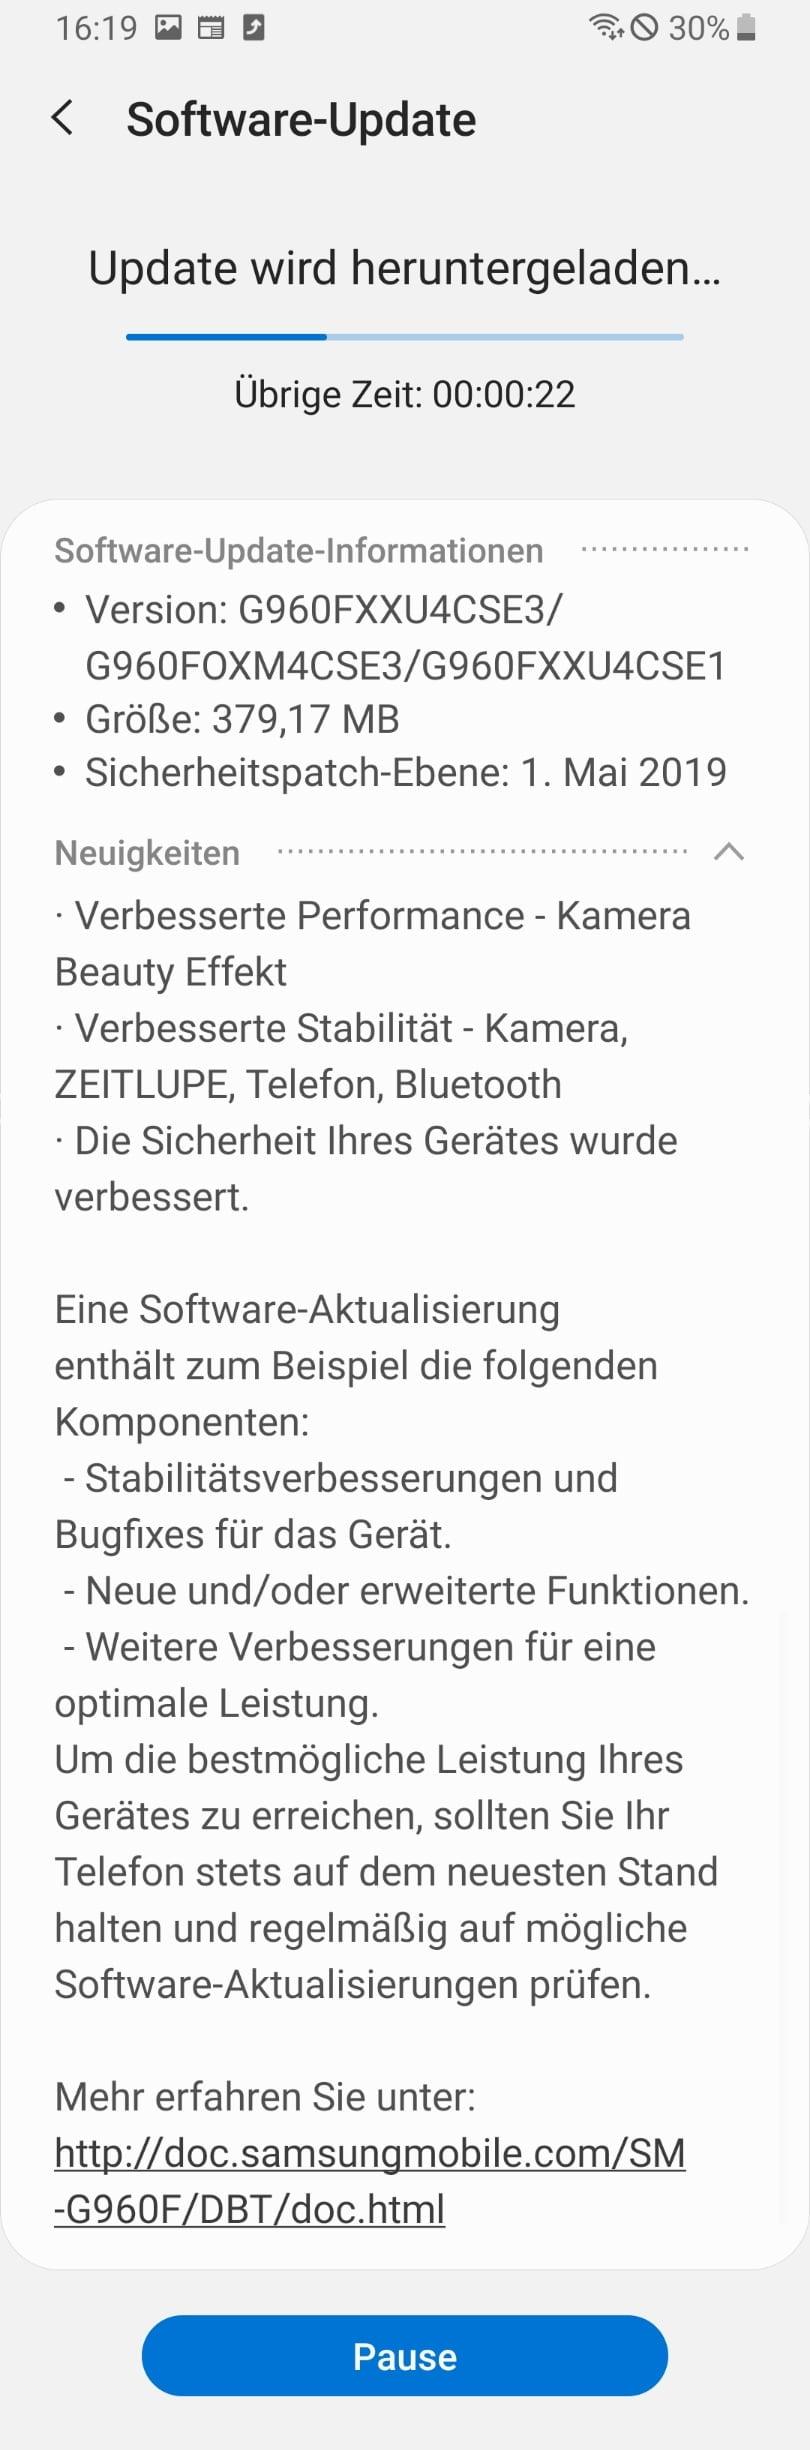 Galaxy S9 Update: Samsung bessert bei der Kamera nach 2 techboys.de • smarte News, auf den Punkt! Galaxy S9 Update: Samsung bessert bei der Kamera nach